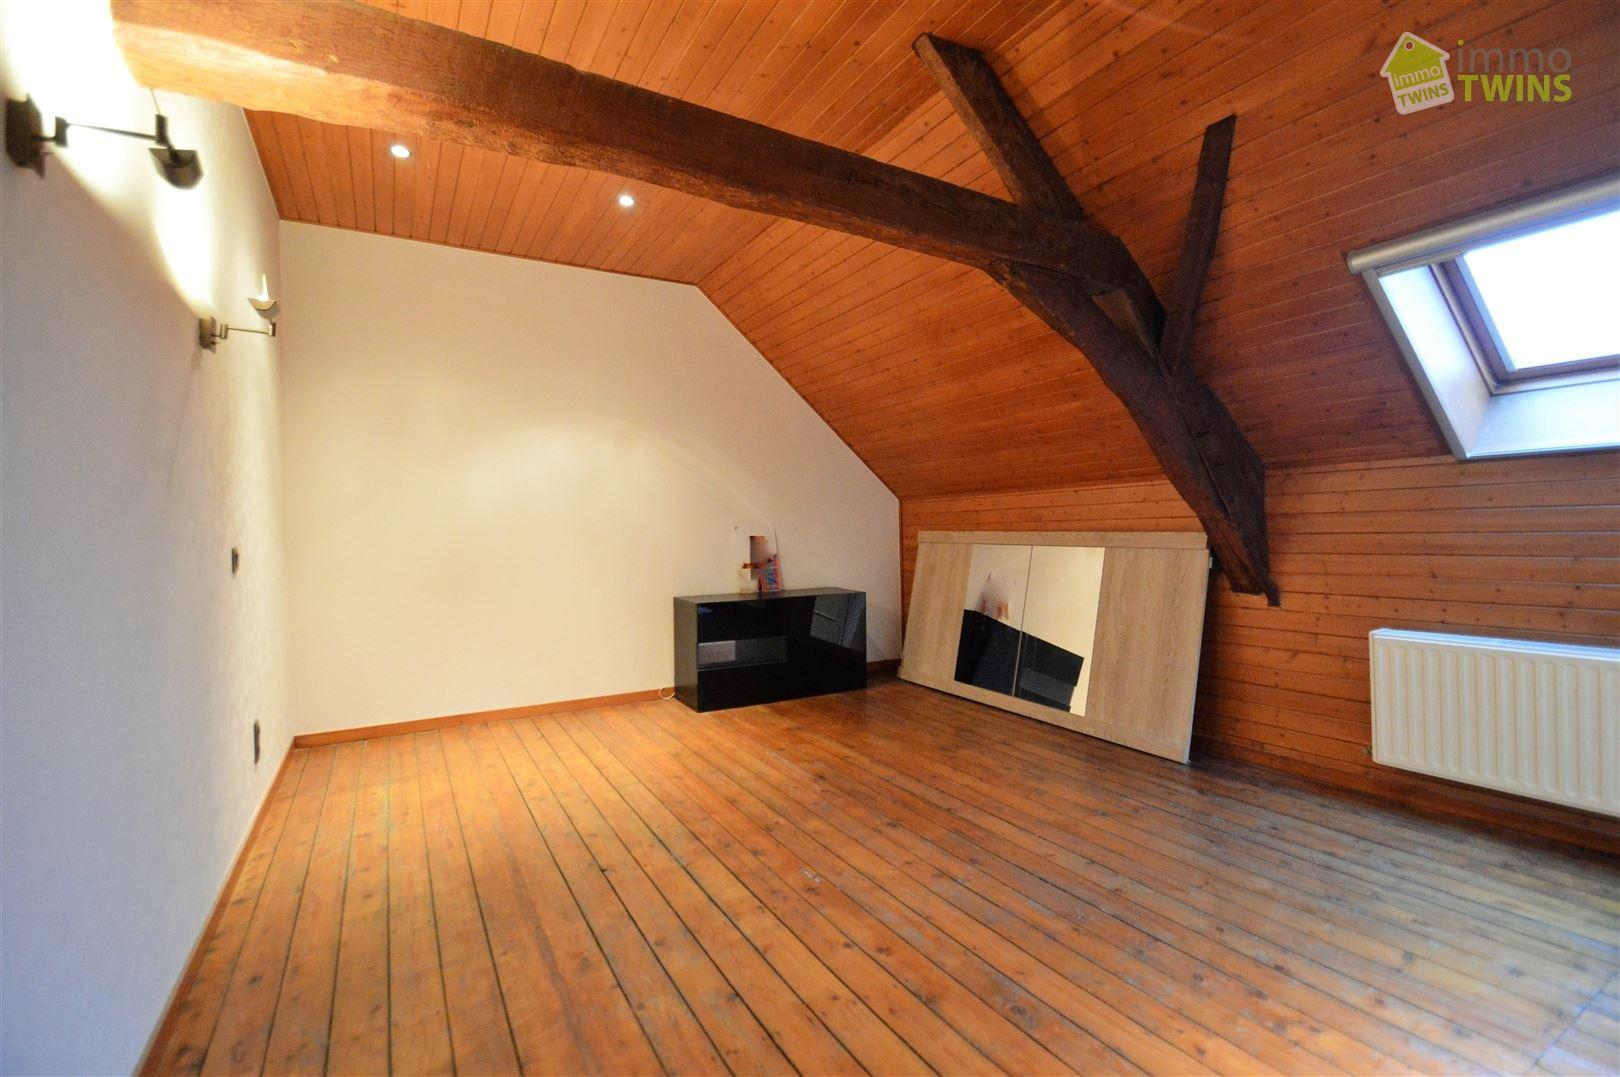 Foto 19 : Duplex/Penthouse te 2890 SINT-AMANDS (België) - Prijs € 449.000